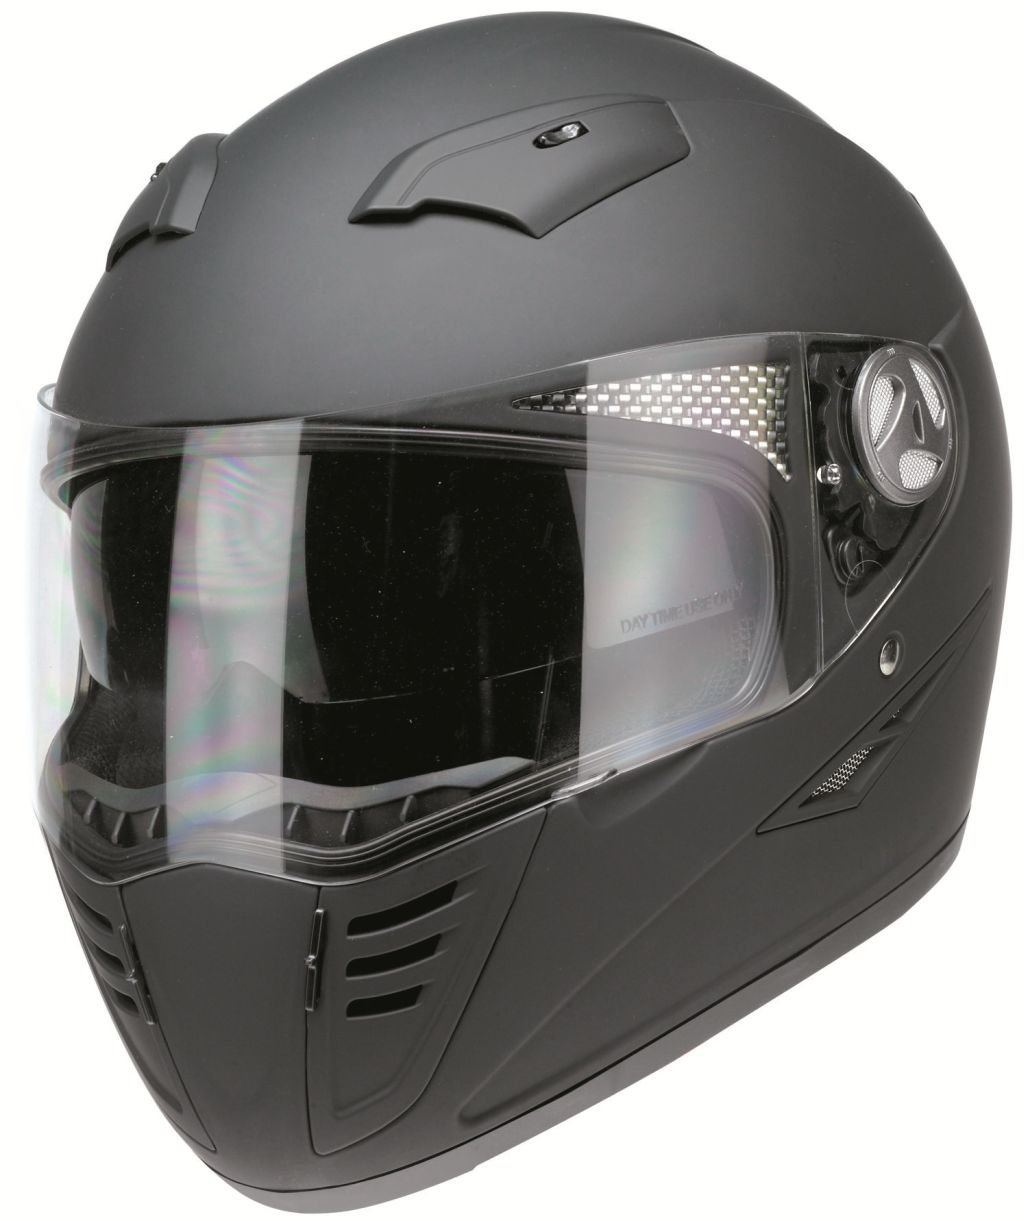 Motorradhelm Motorrad Roller Kart Helm Kochmann RB 1200 Matt Schwarz XS-XXL